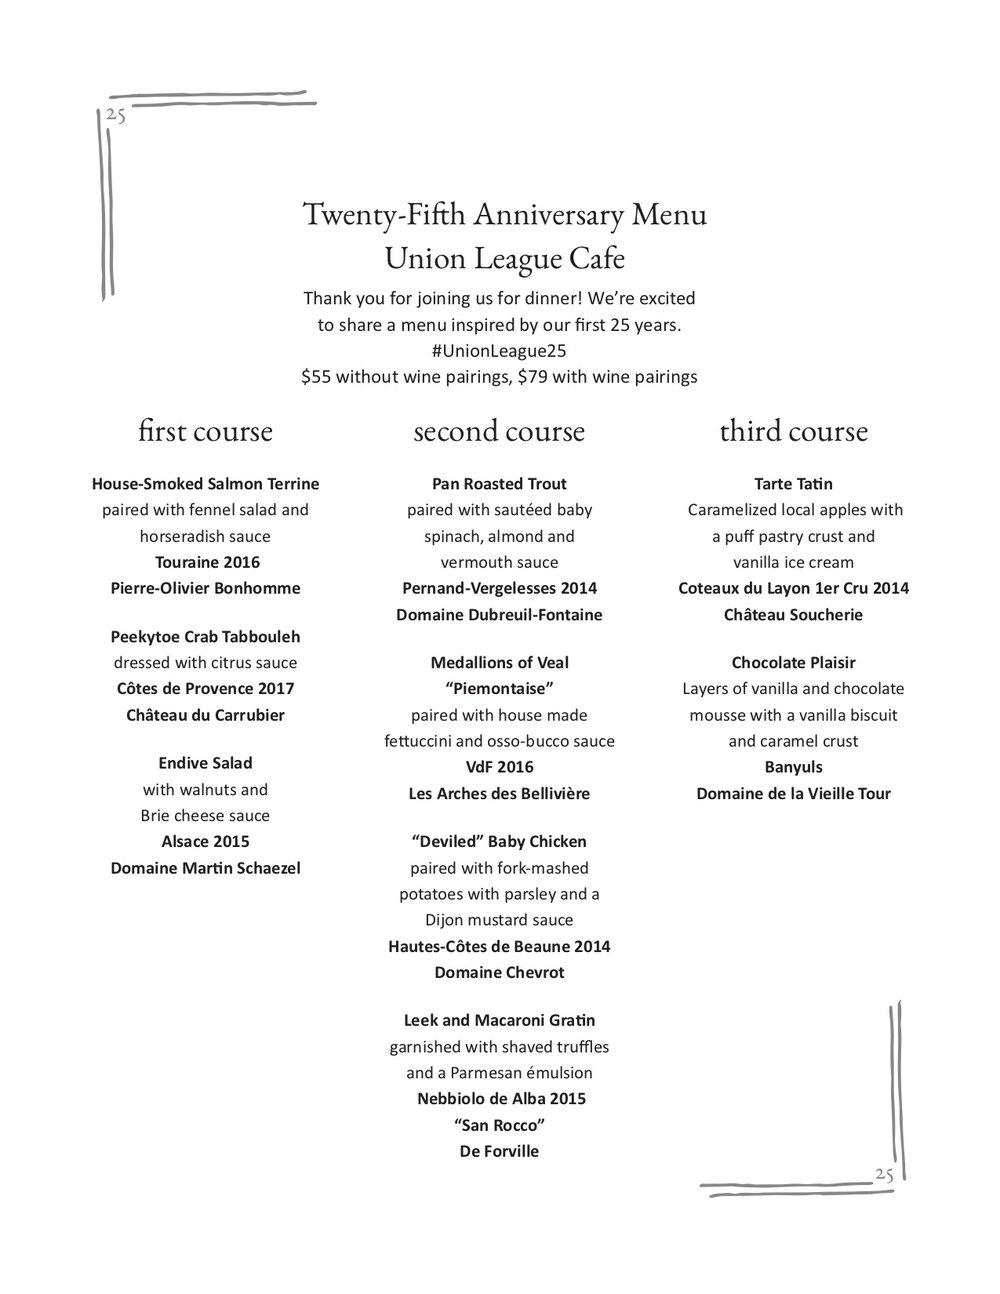 Union League Cafe 25th Anniversary Menu